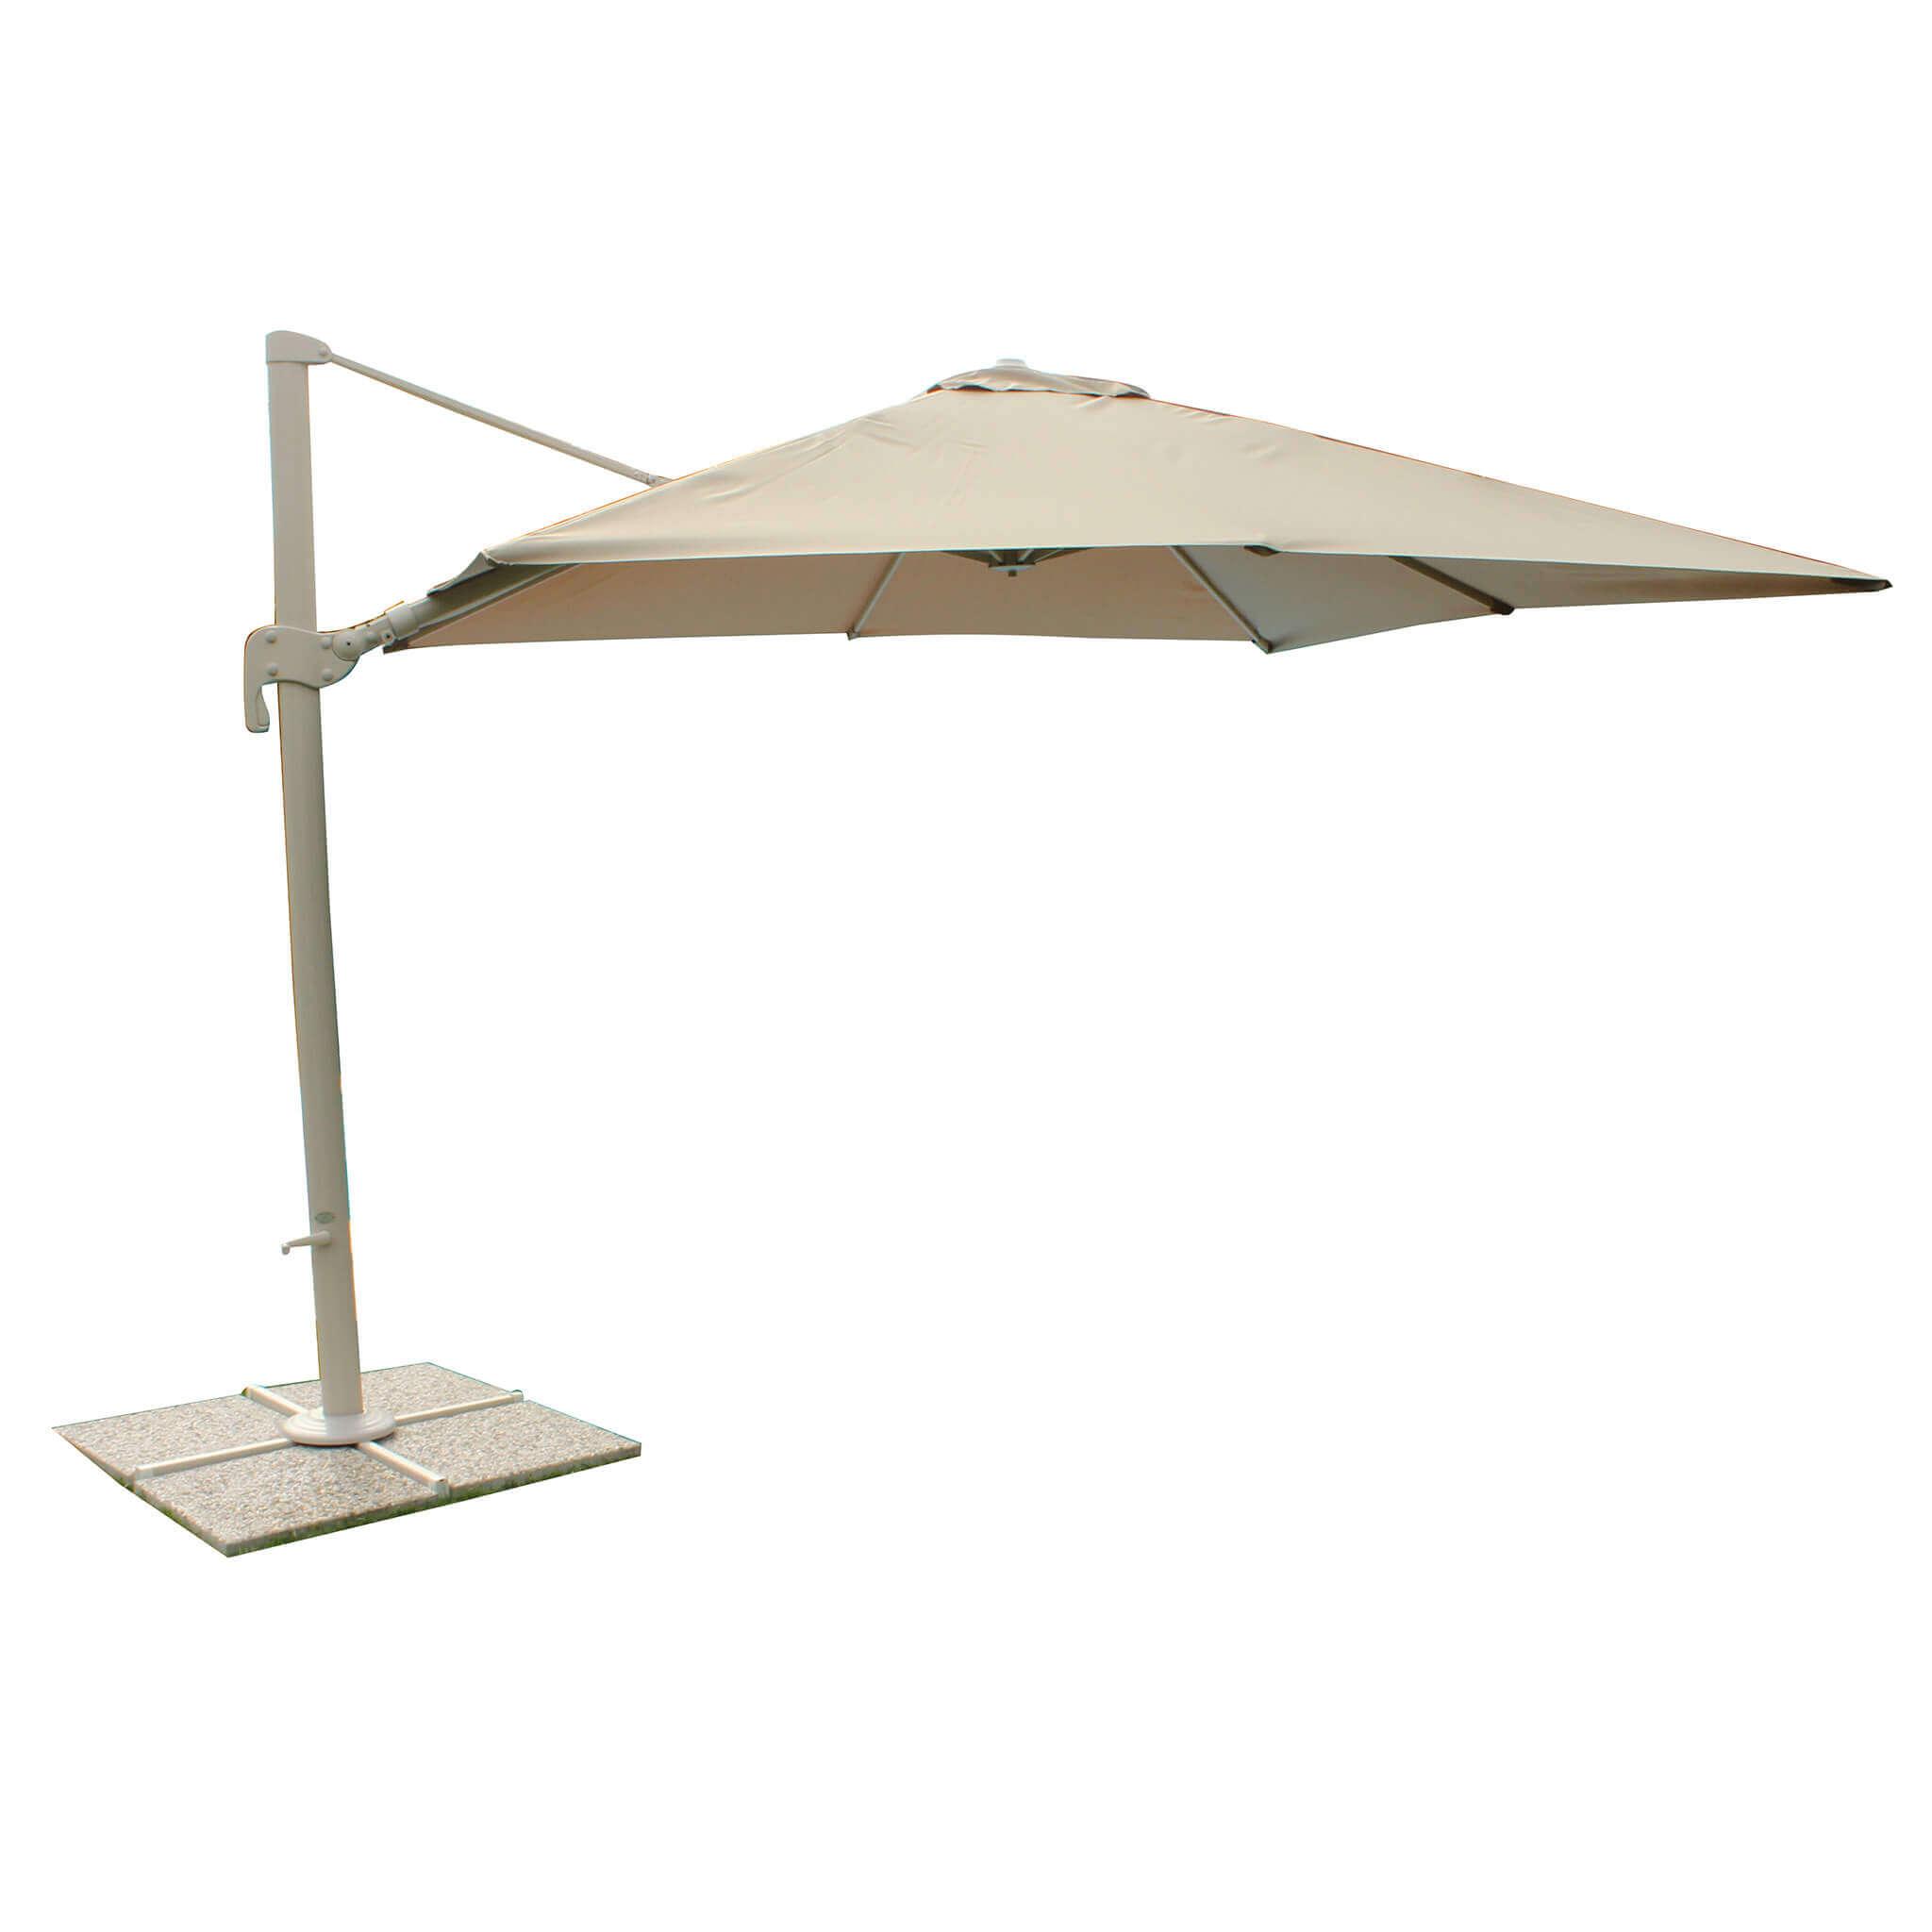 Milani Home SAGITTARIUS - ombrellone da giardino 3 x 4 decentrato